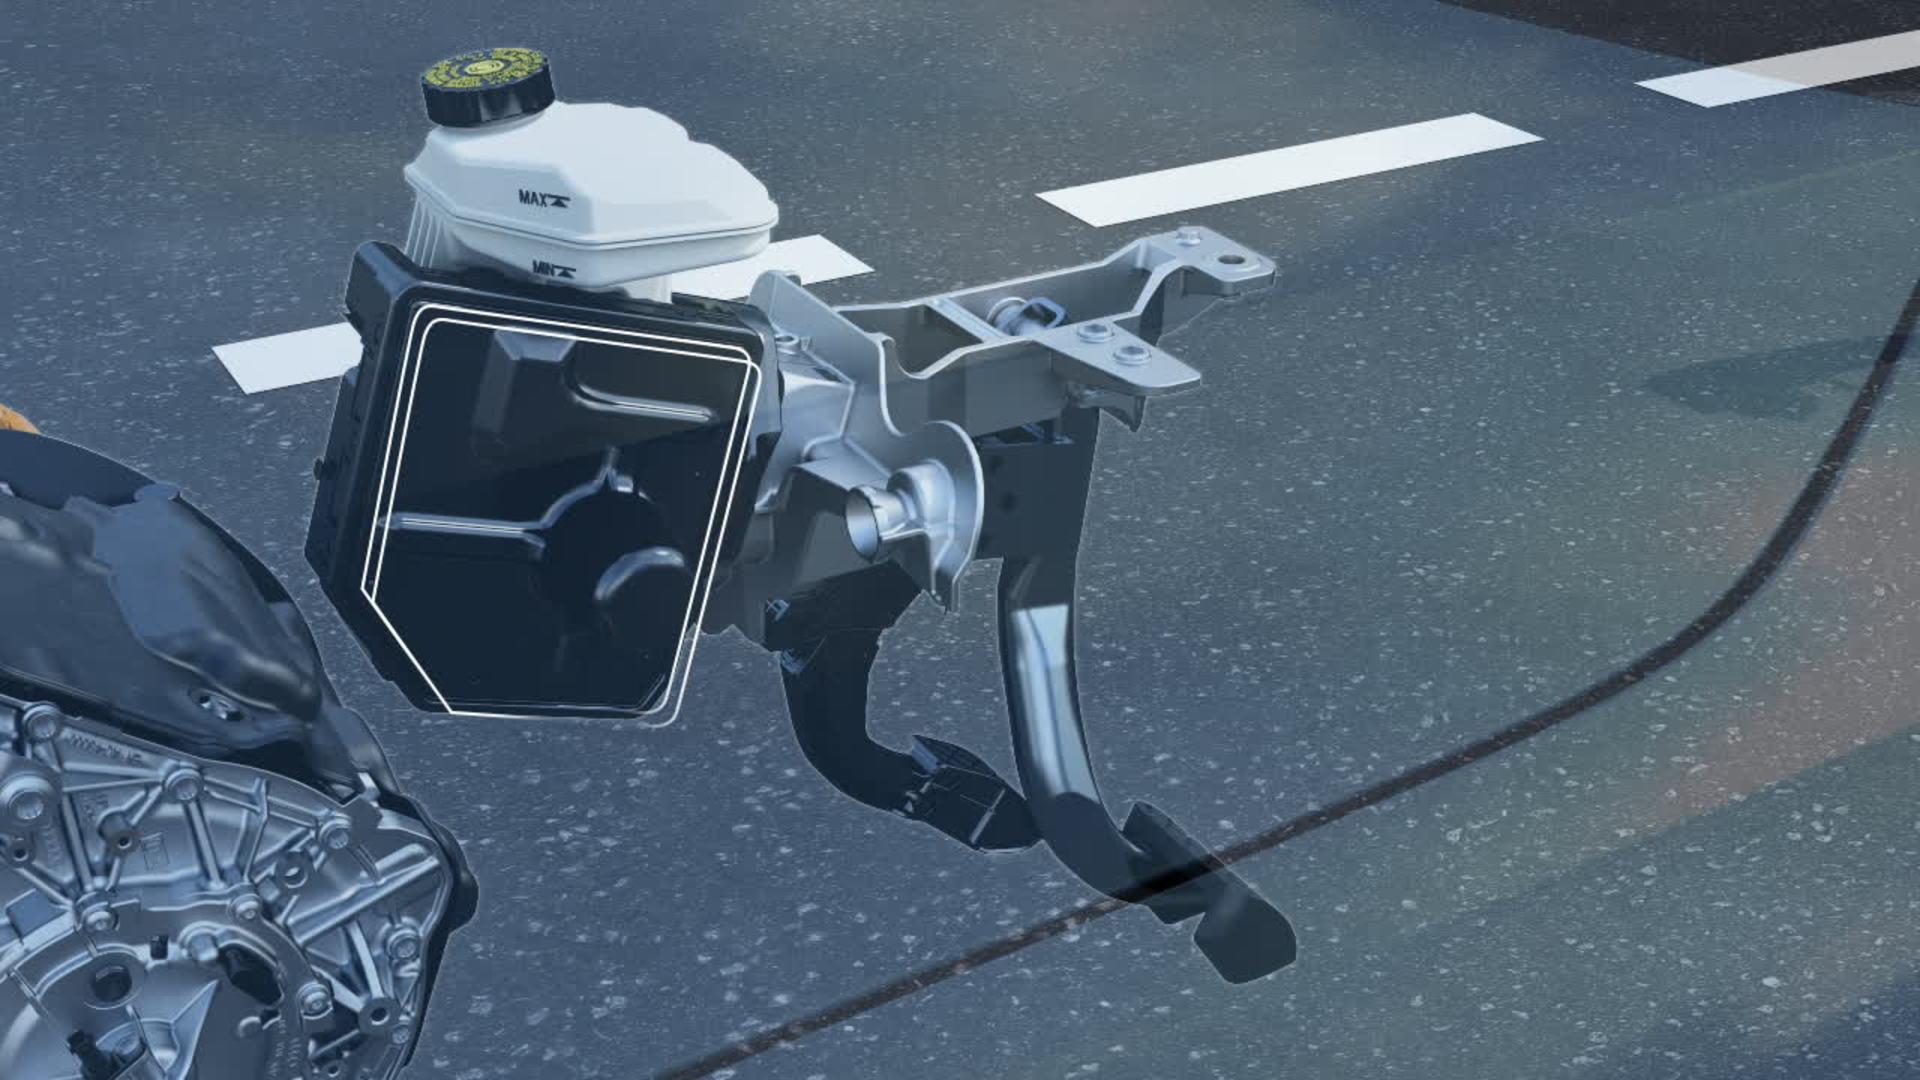 Brake-by-wire system of the Audi e-tron (animation) | Video | Audi MediaTV